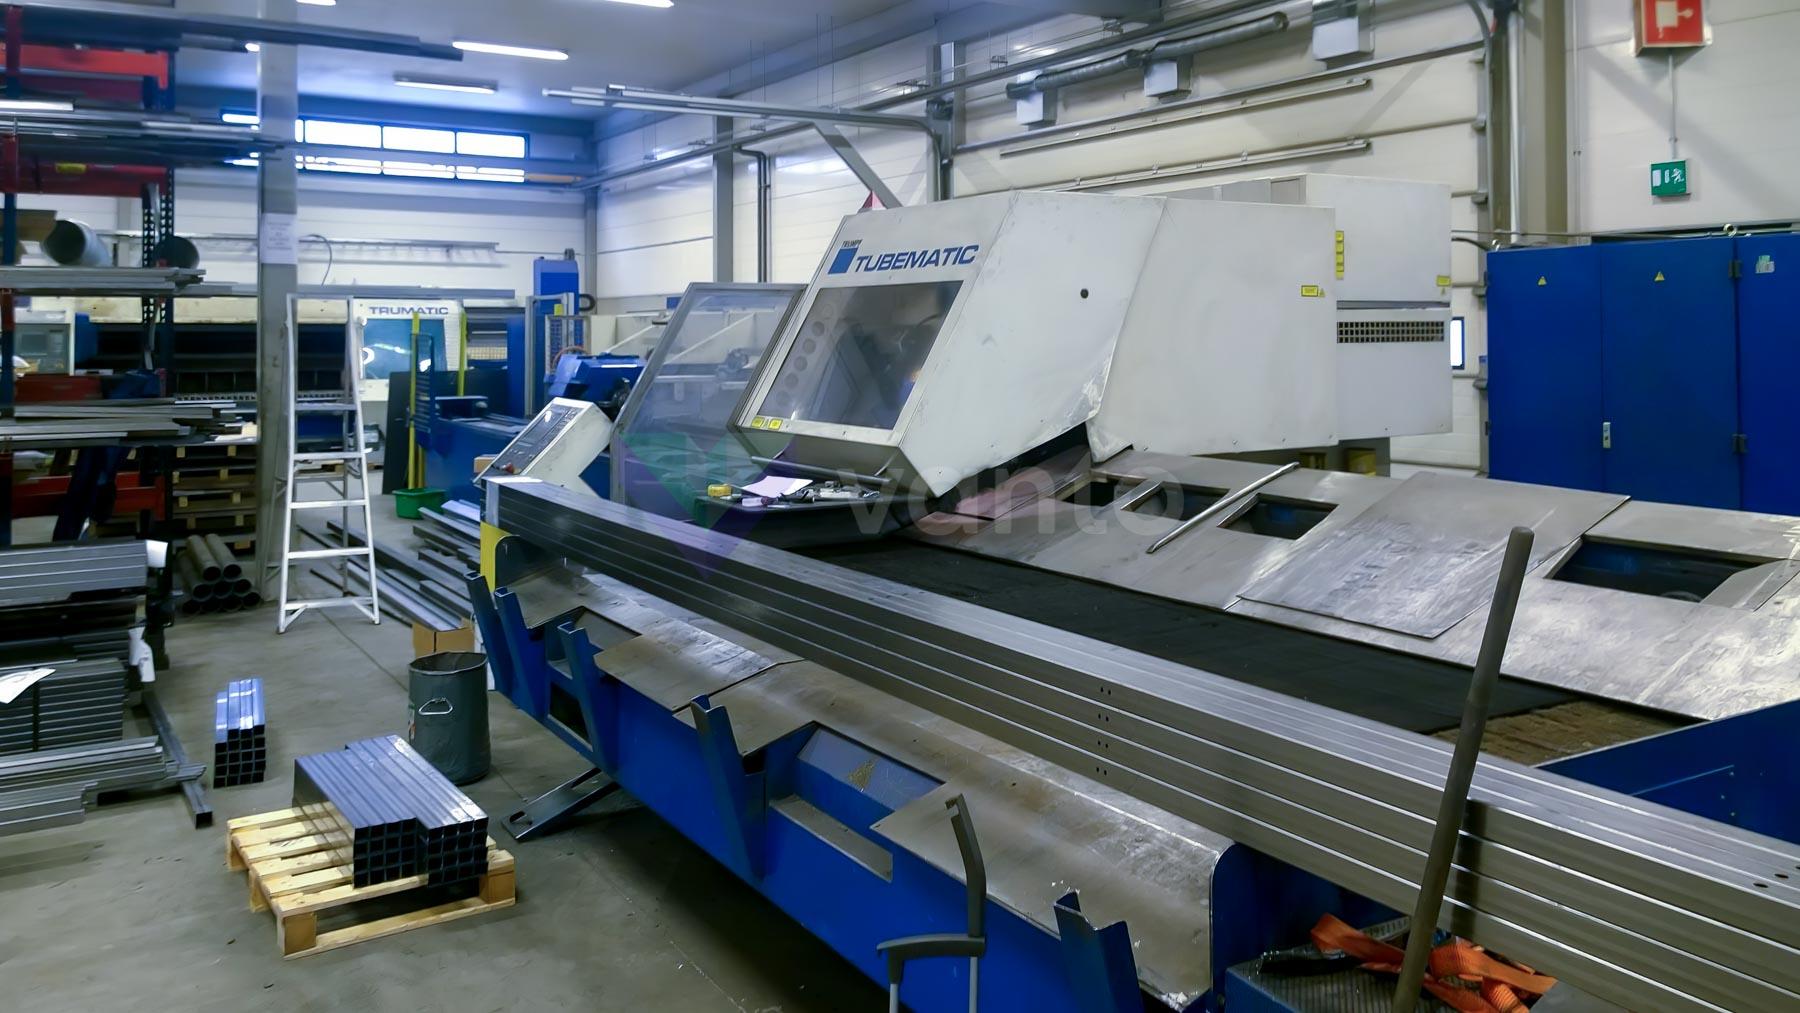 TRUMPF TUBEMATIC 5000 Laser pipe cutting machine (2004) id10429